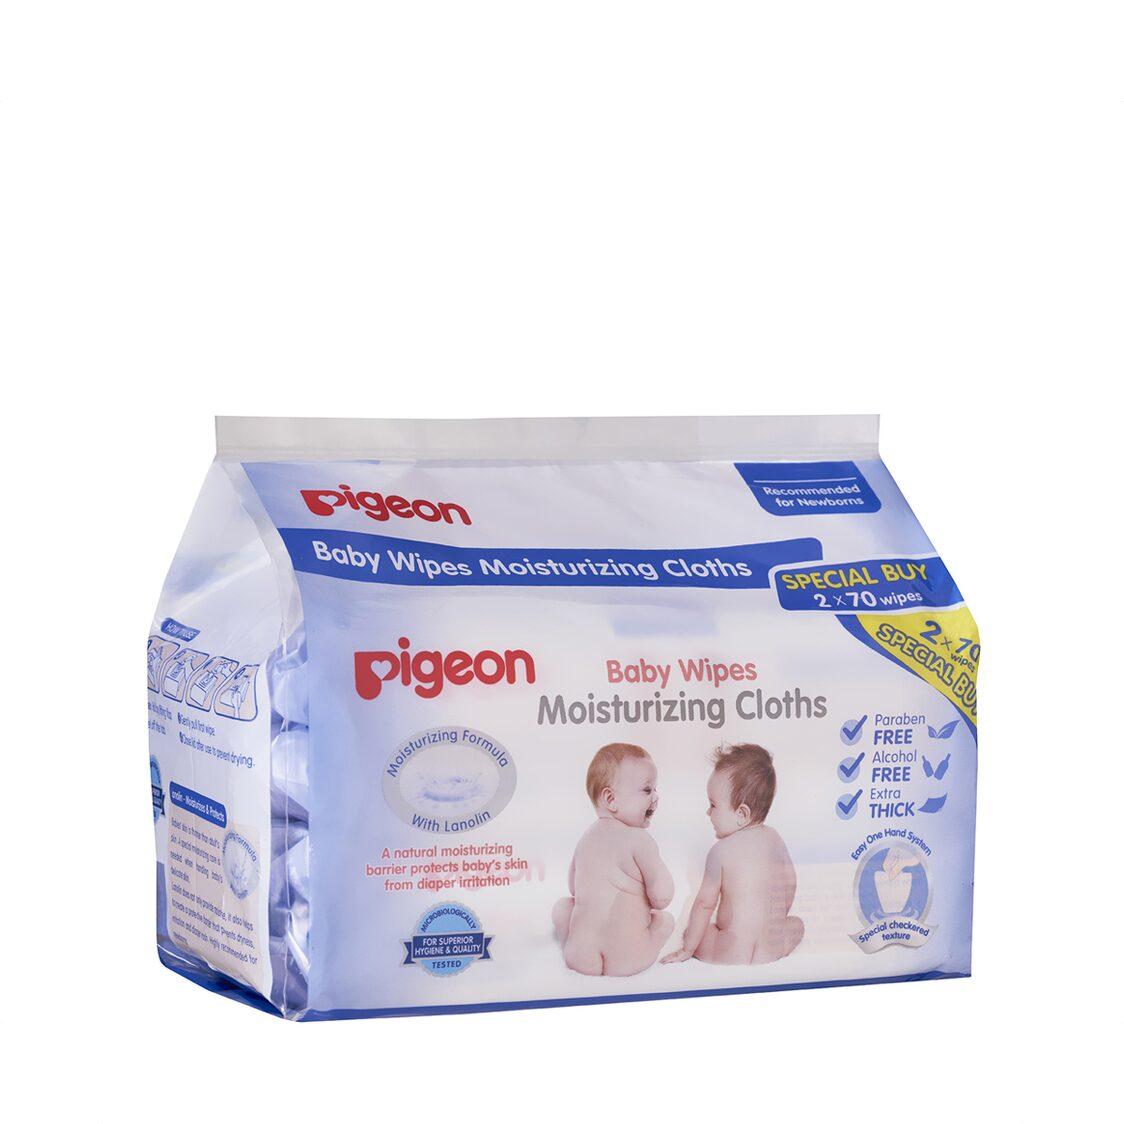 Pigeon Moisturizing Cloth 2in1 70s